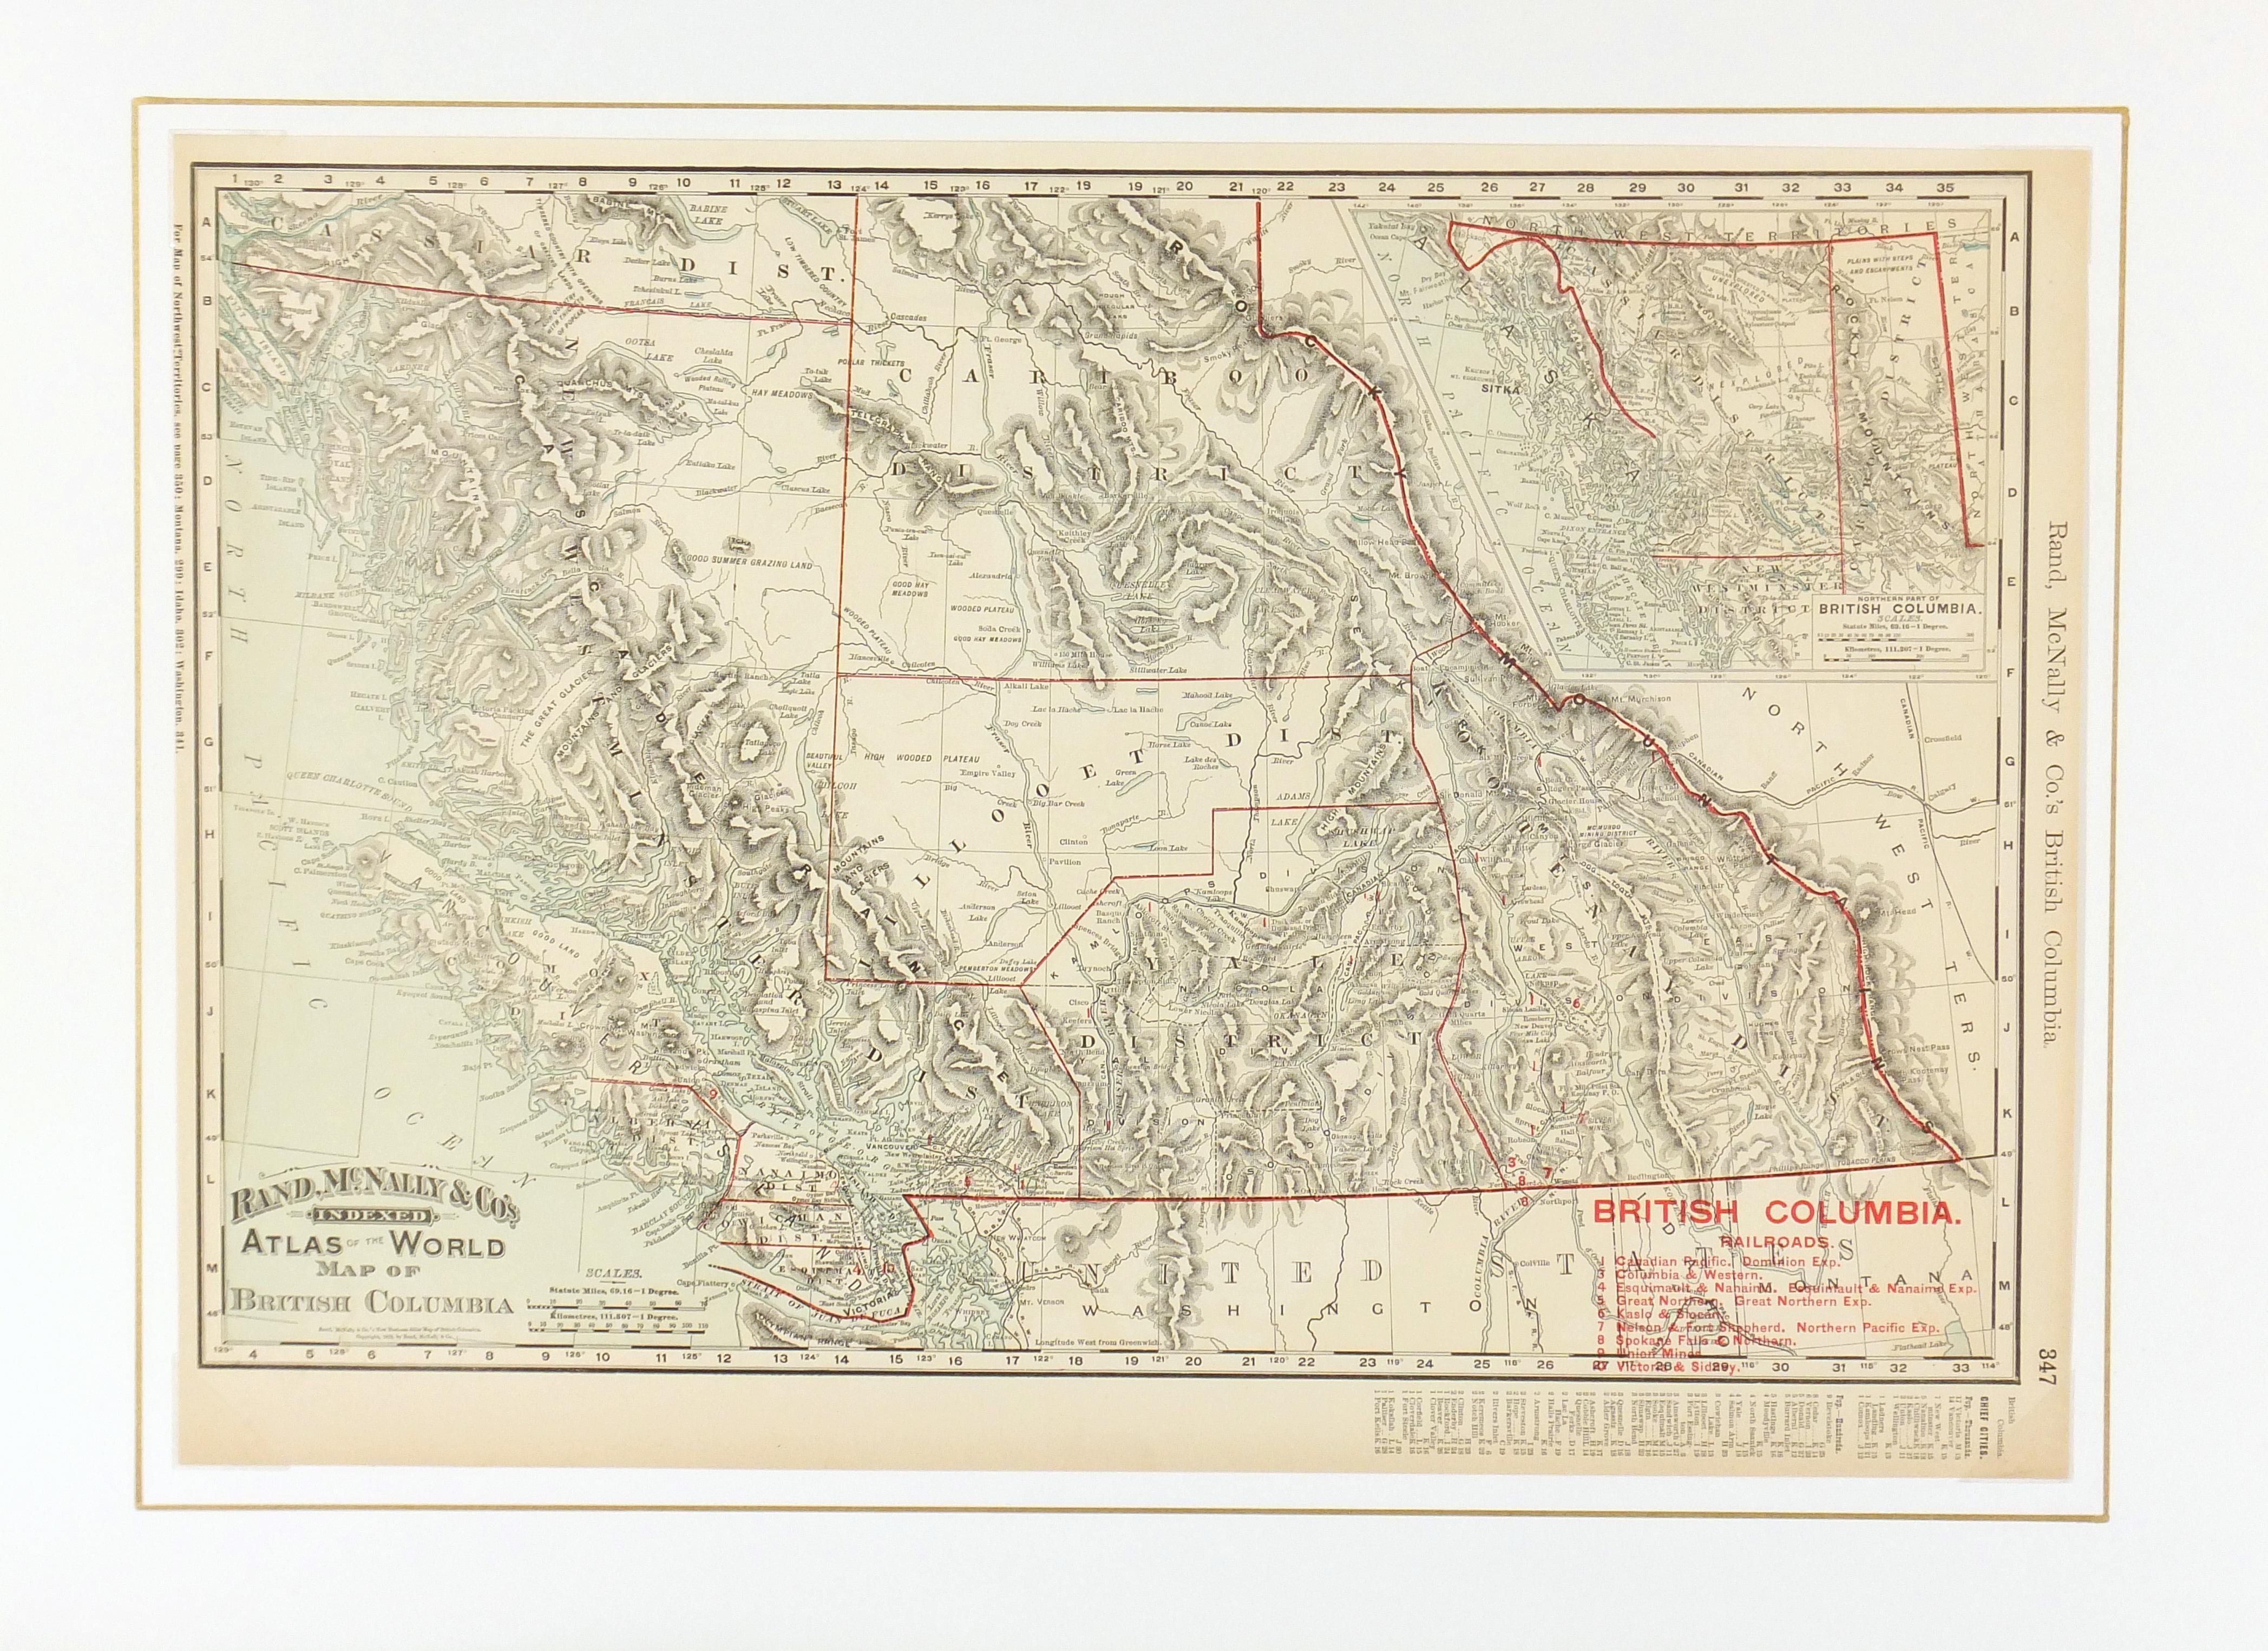 British Columbia, Canada Map, 1895-matted-6587K